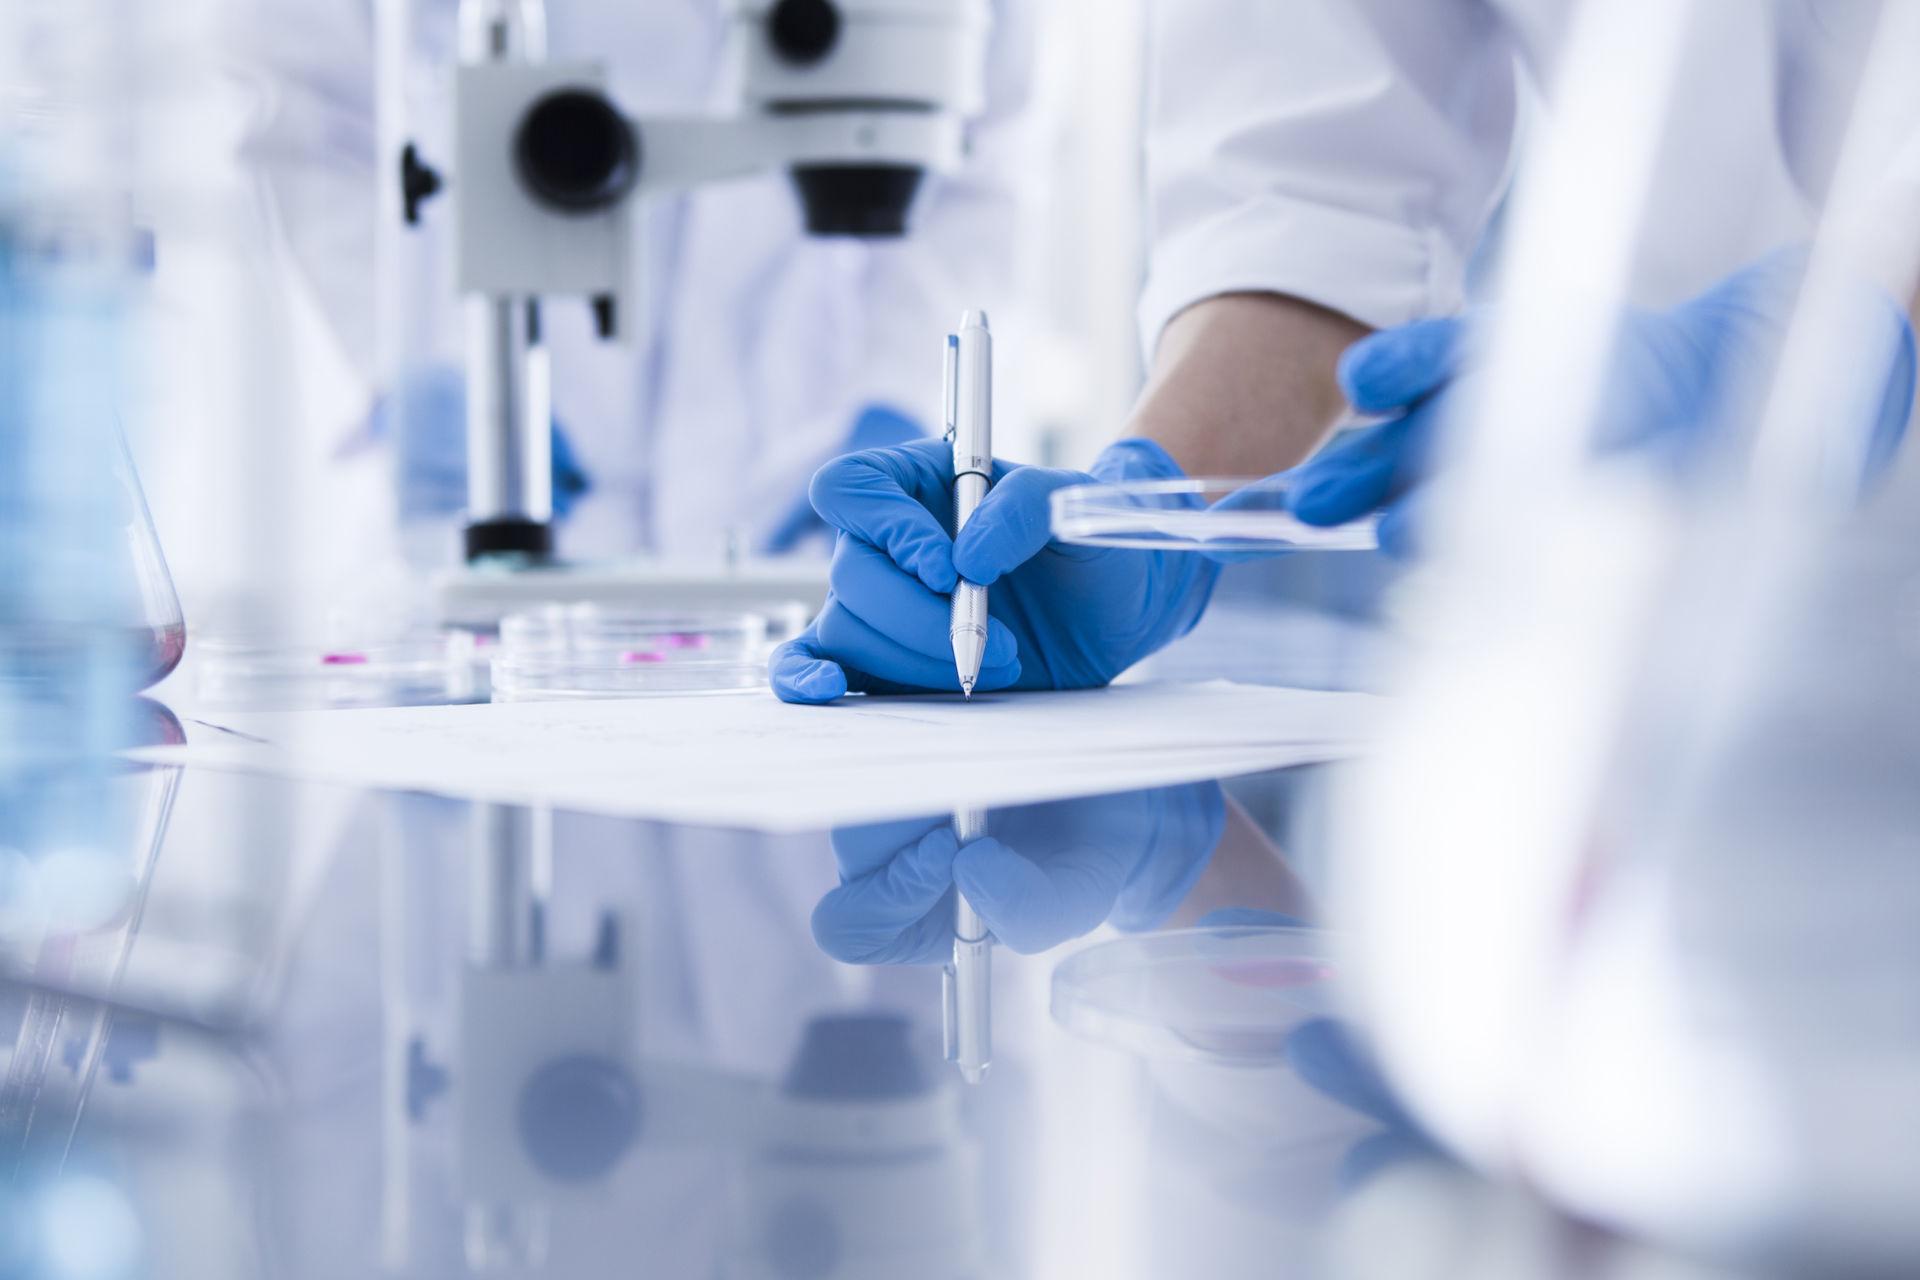 University of Nottingham: Research Associate/Fellow (Bacteria-polymer interfacial analysis)